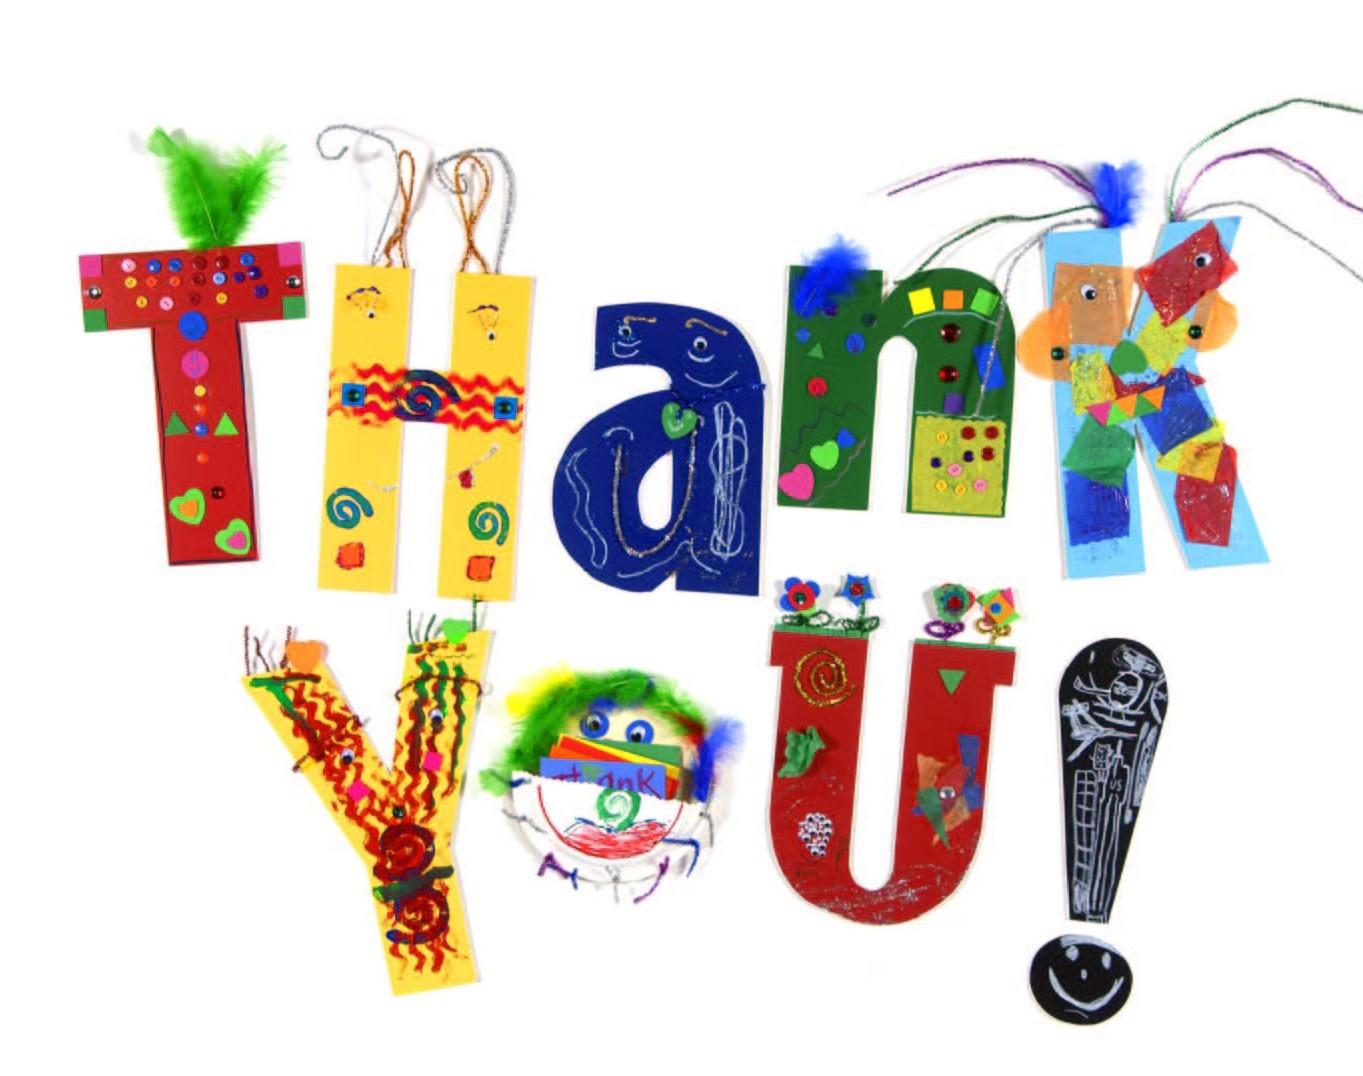 A GIANT THANK YOU!! xox Thank-you